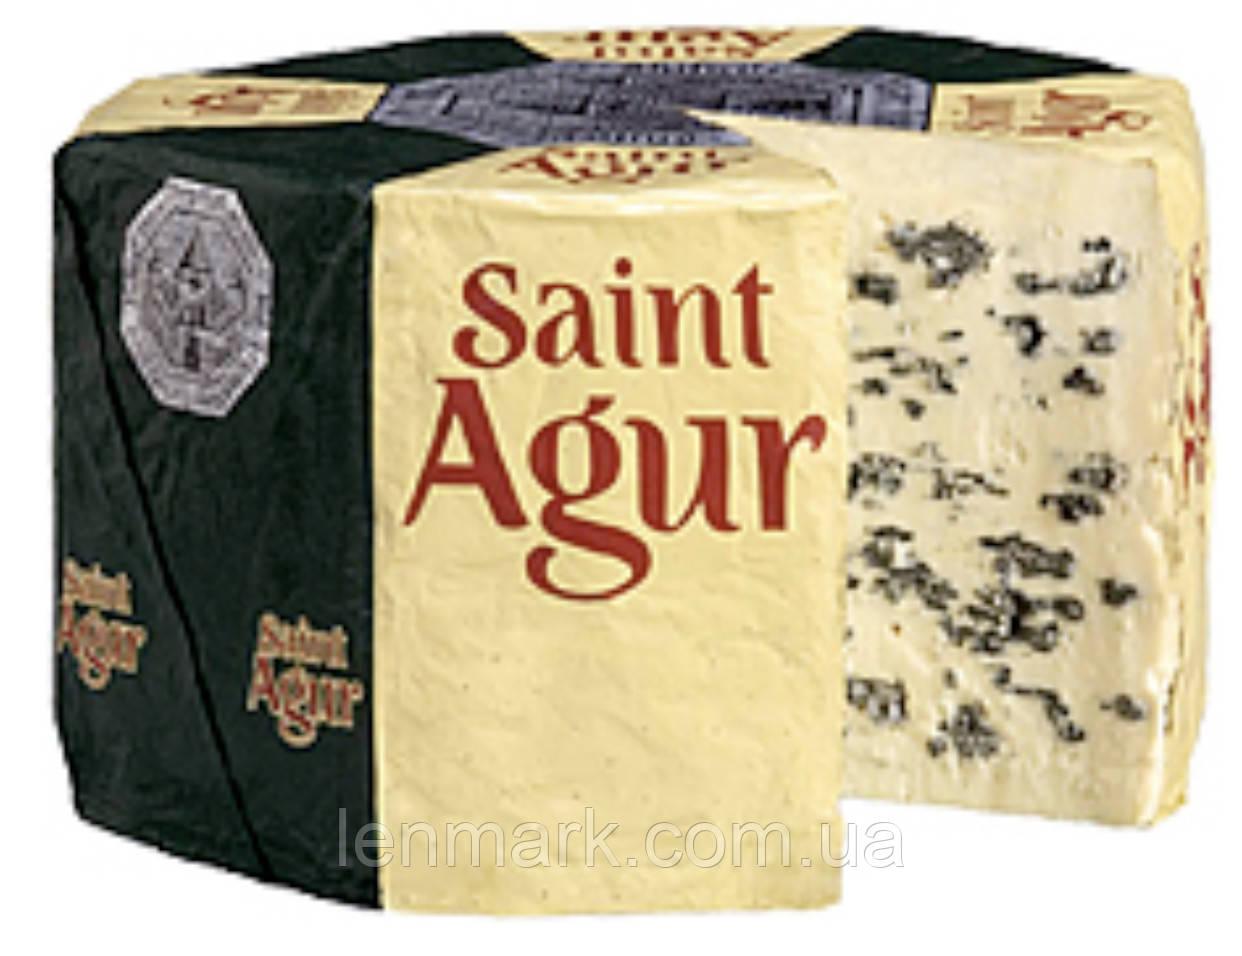 Сыр с плесенью Saint Agur